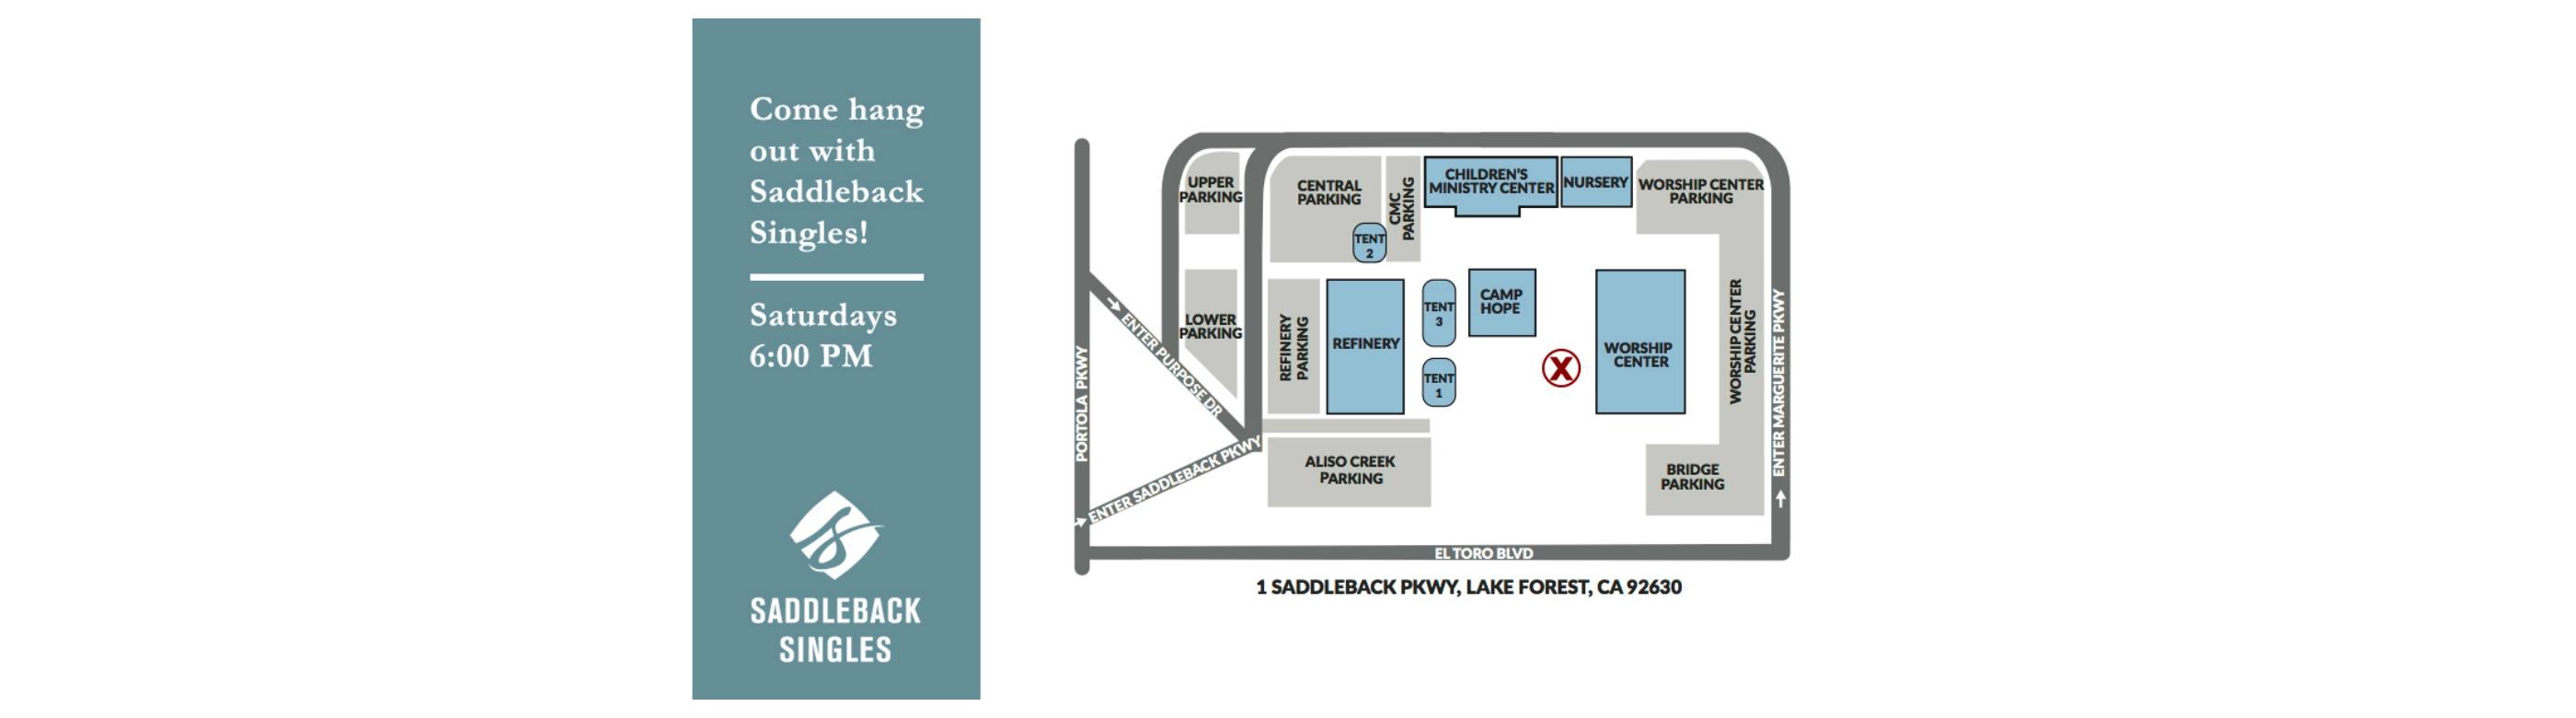 saddleback church campus map Saddleback Church Events All Singles Every Saturday Night saddleback church campus map